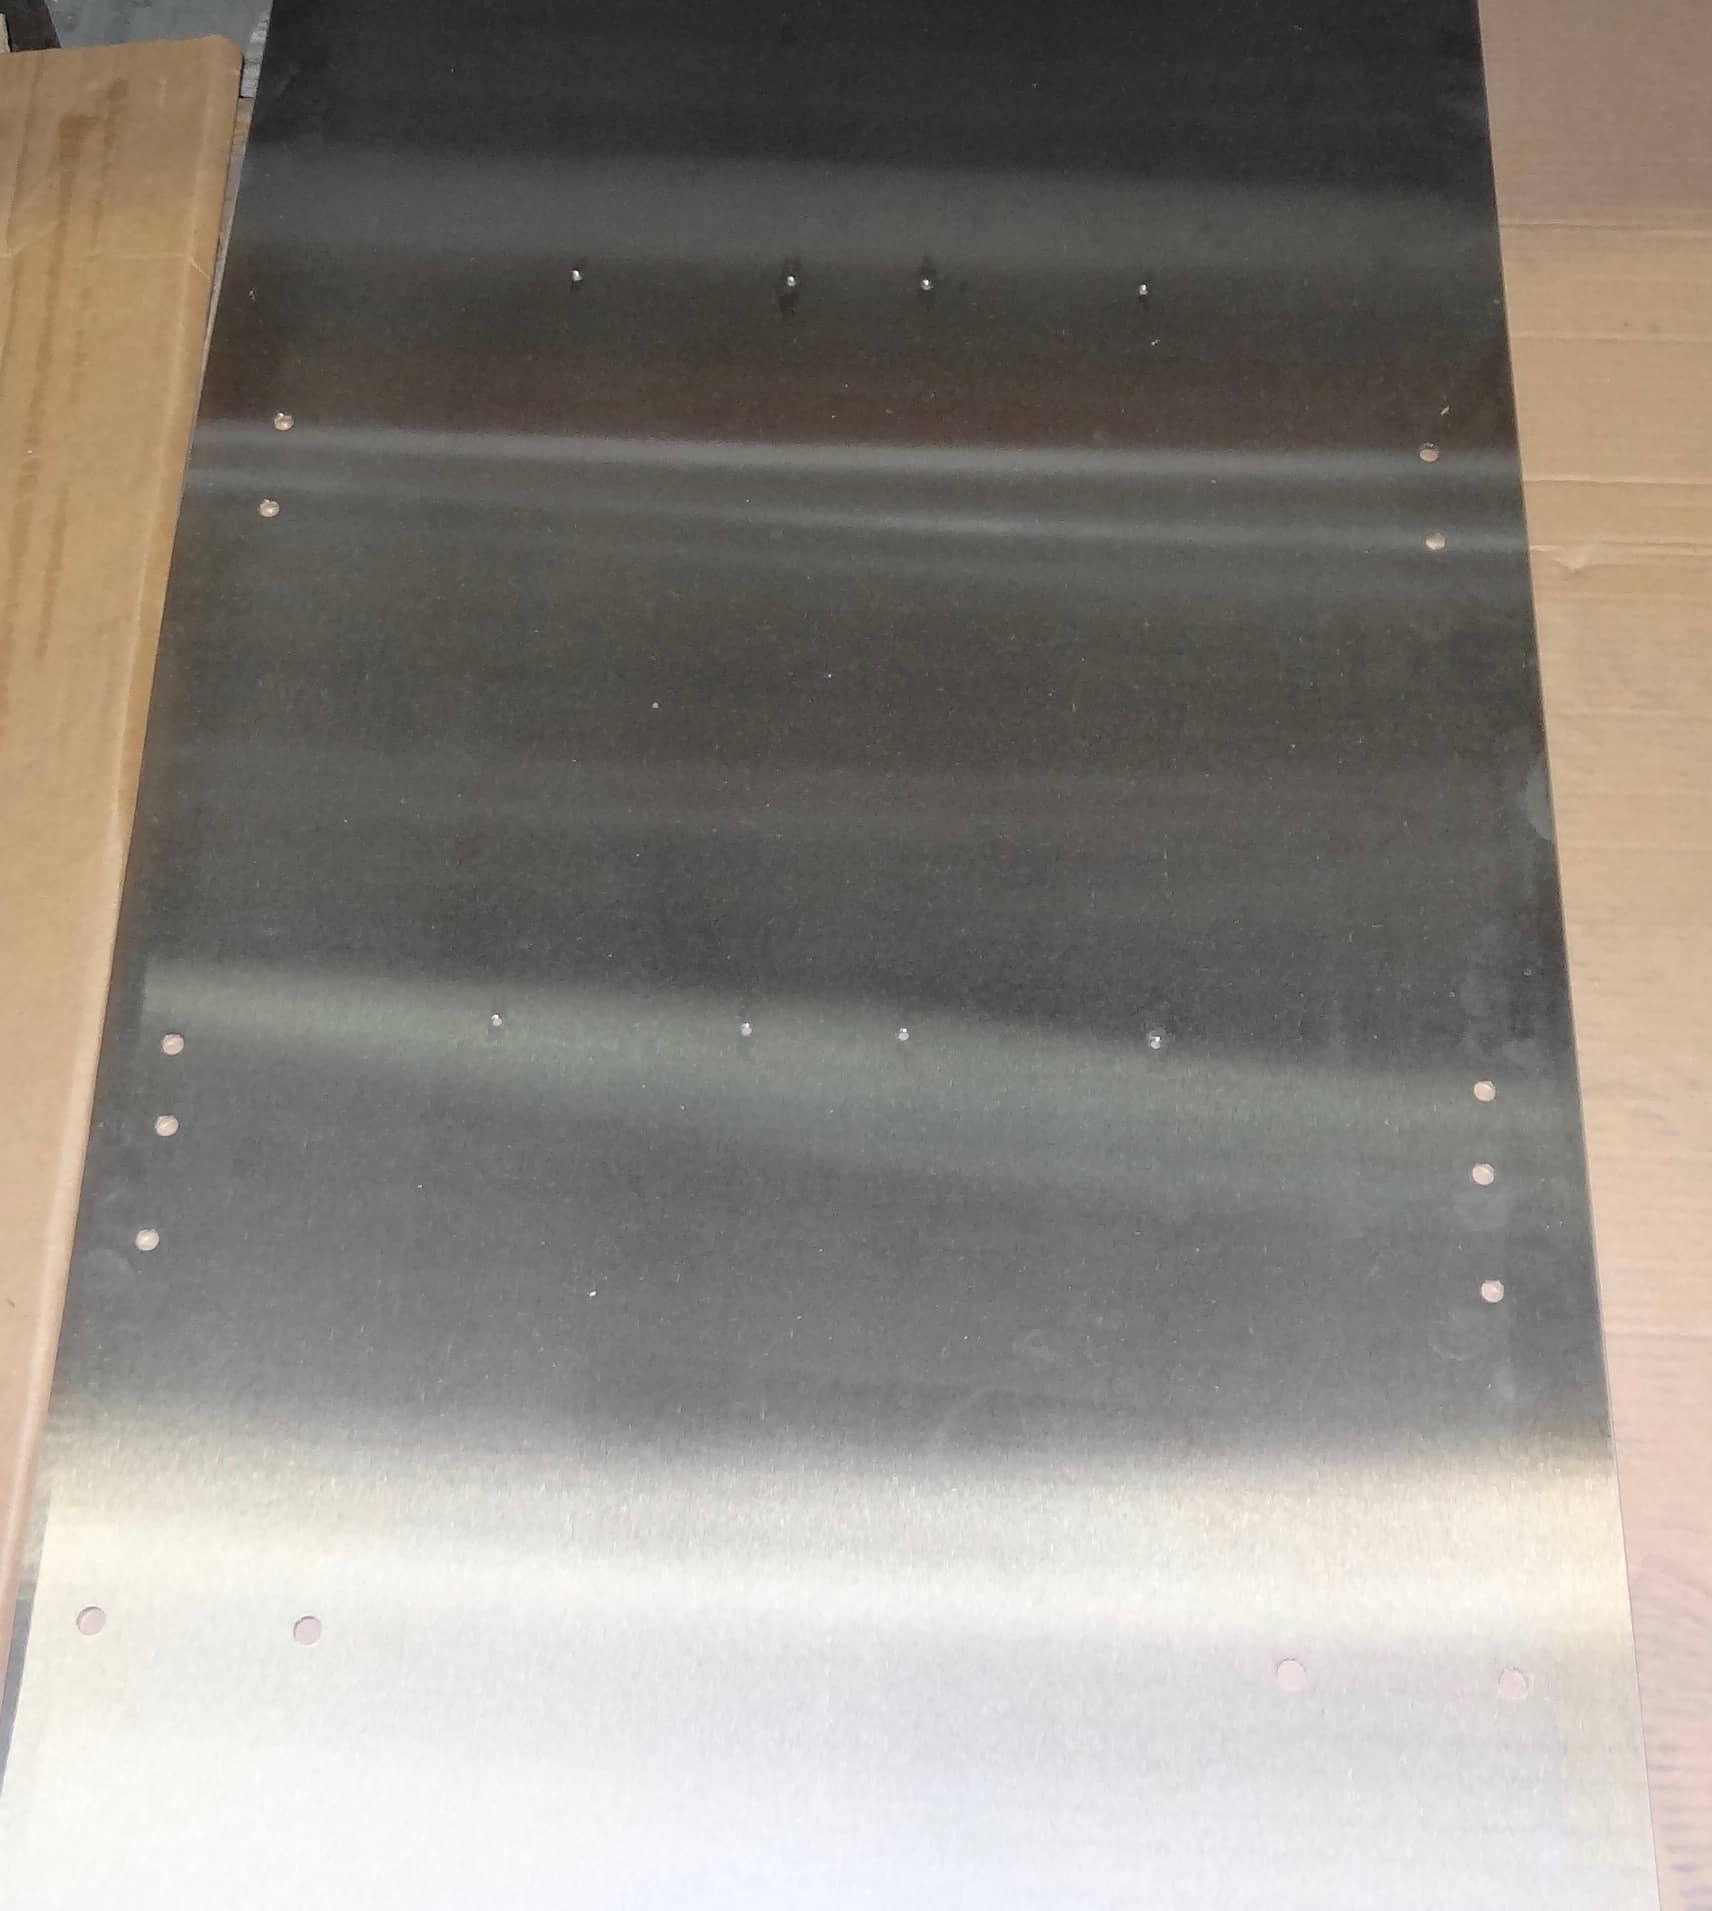 Custom Sheet Metal : Buy online custom cut metals fabrication services in usa